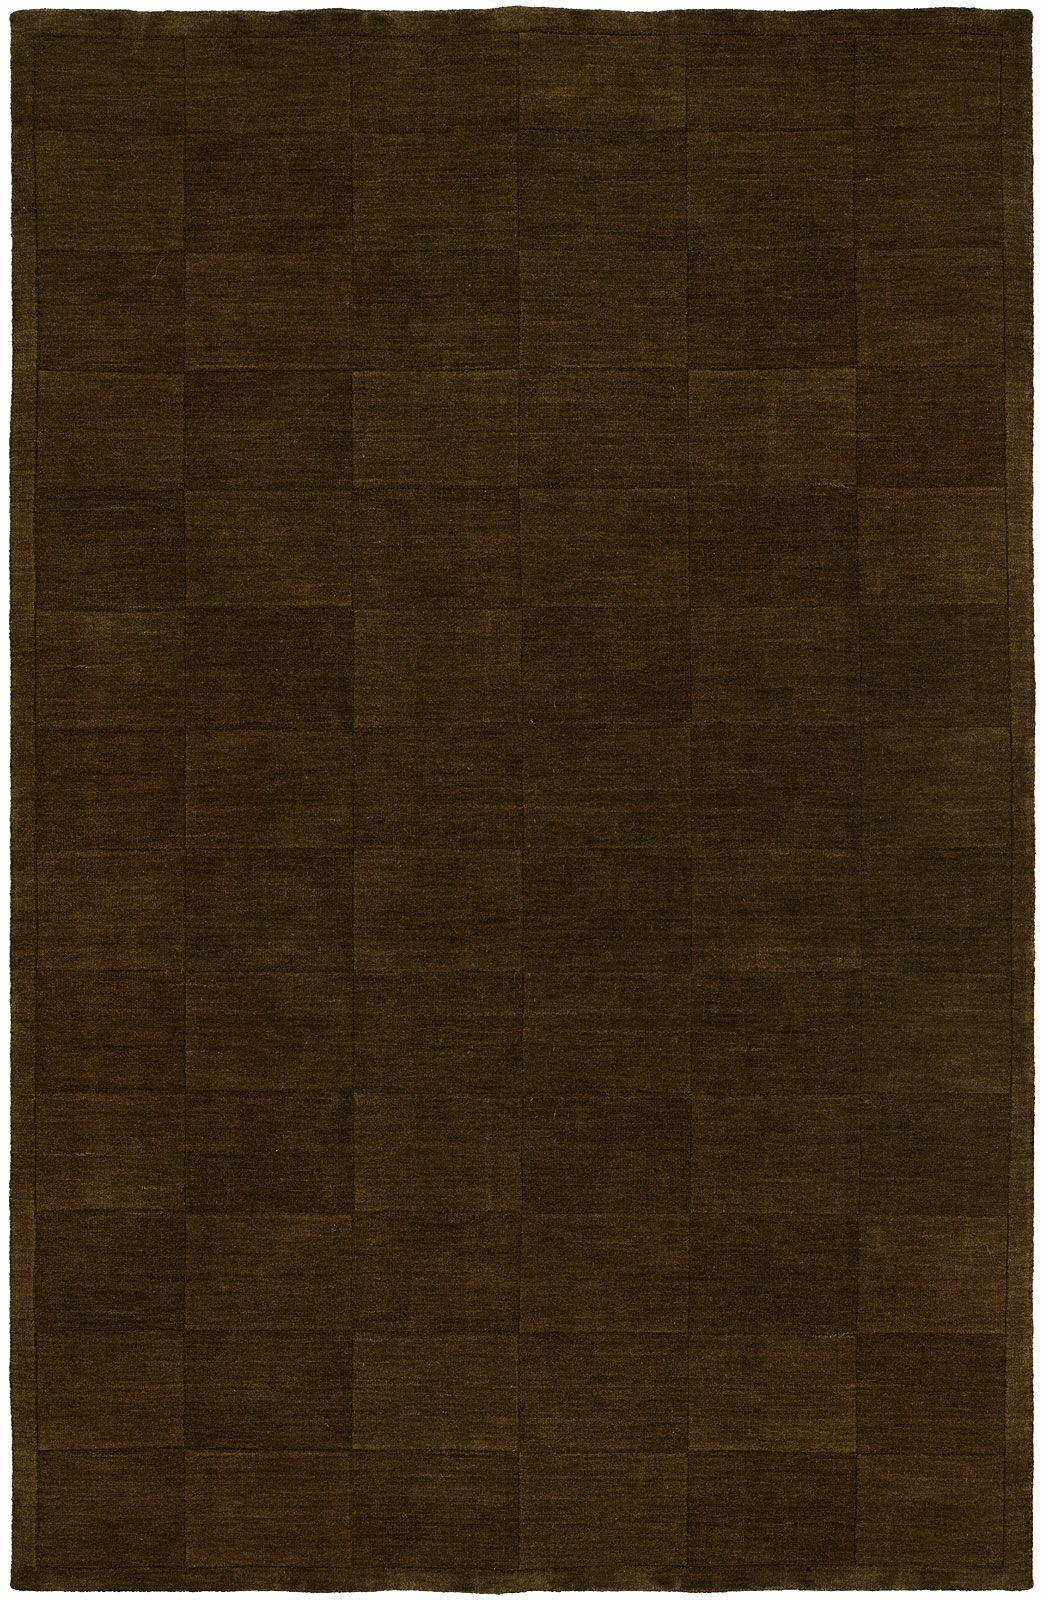 Chadha Hand-Woven Brown Area Rug Rug Size: 8' x 10'